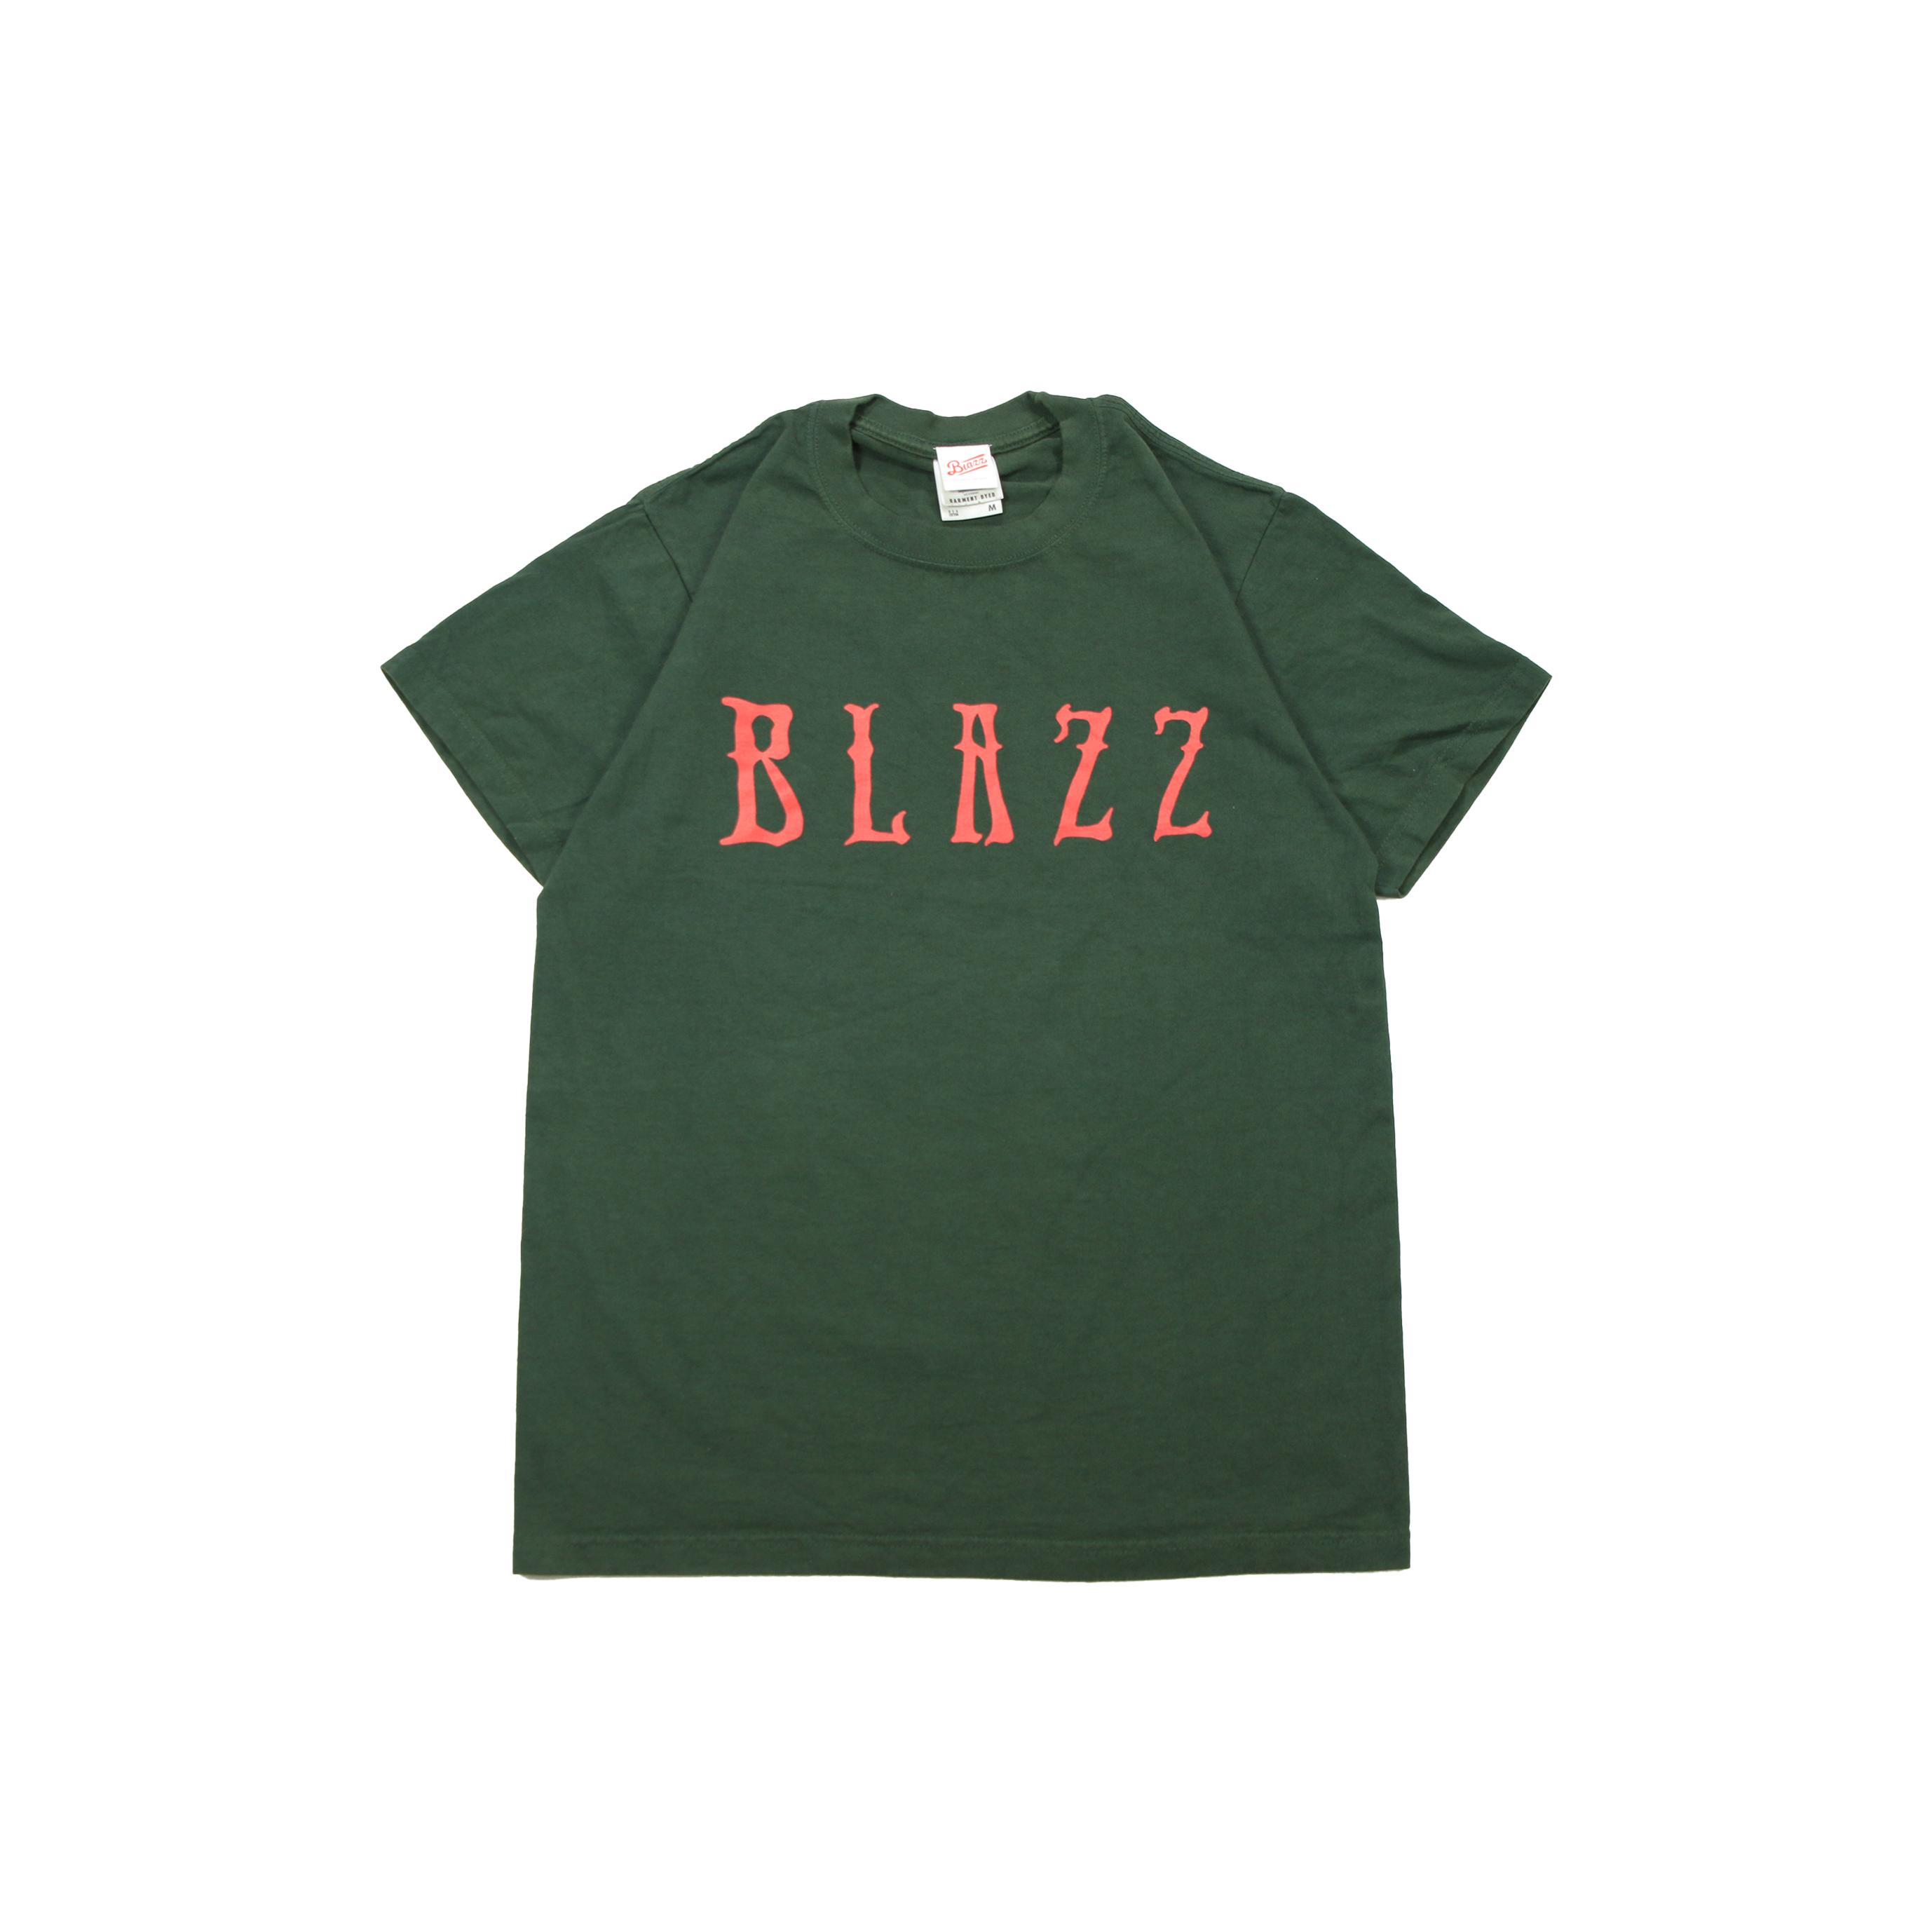 Euro Blazz Super Heavy Garment Dye TEE [GREEN/RED]